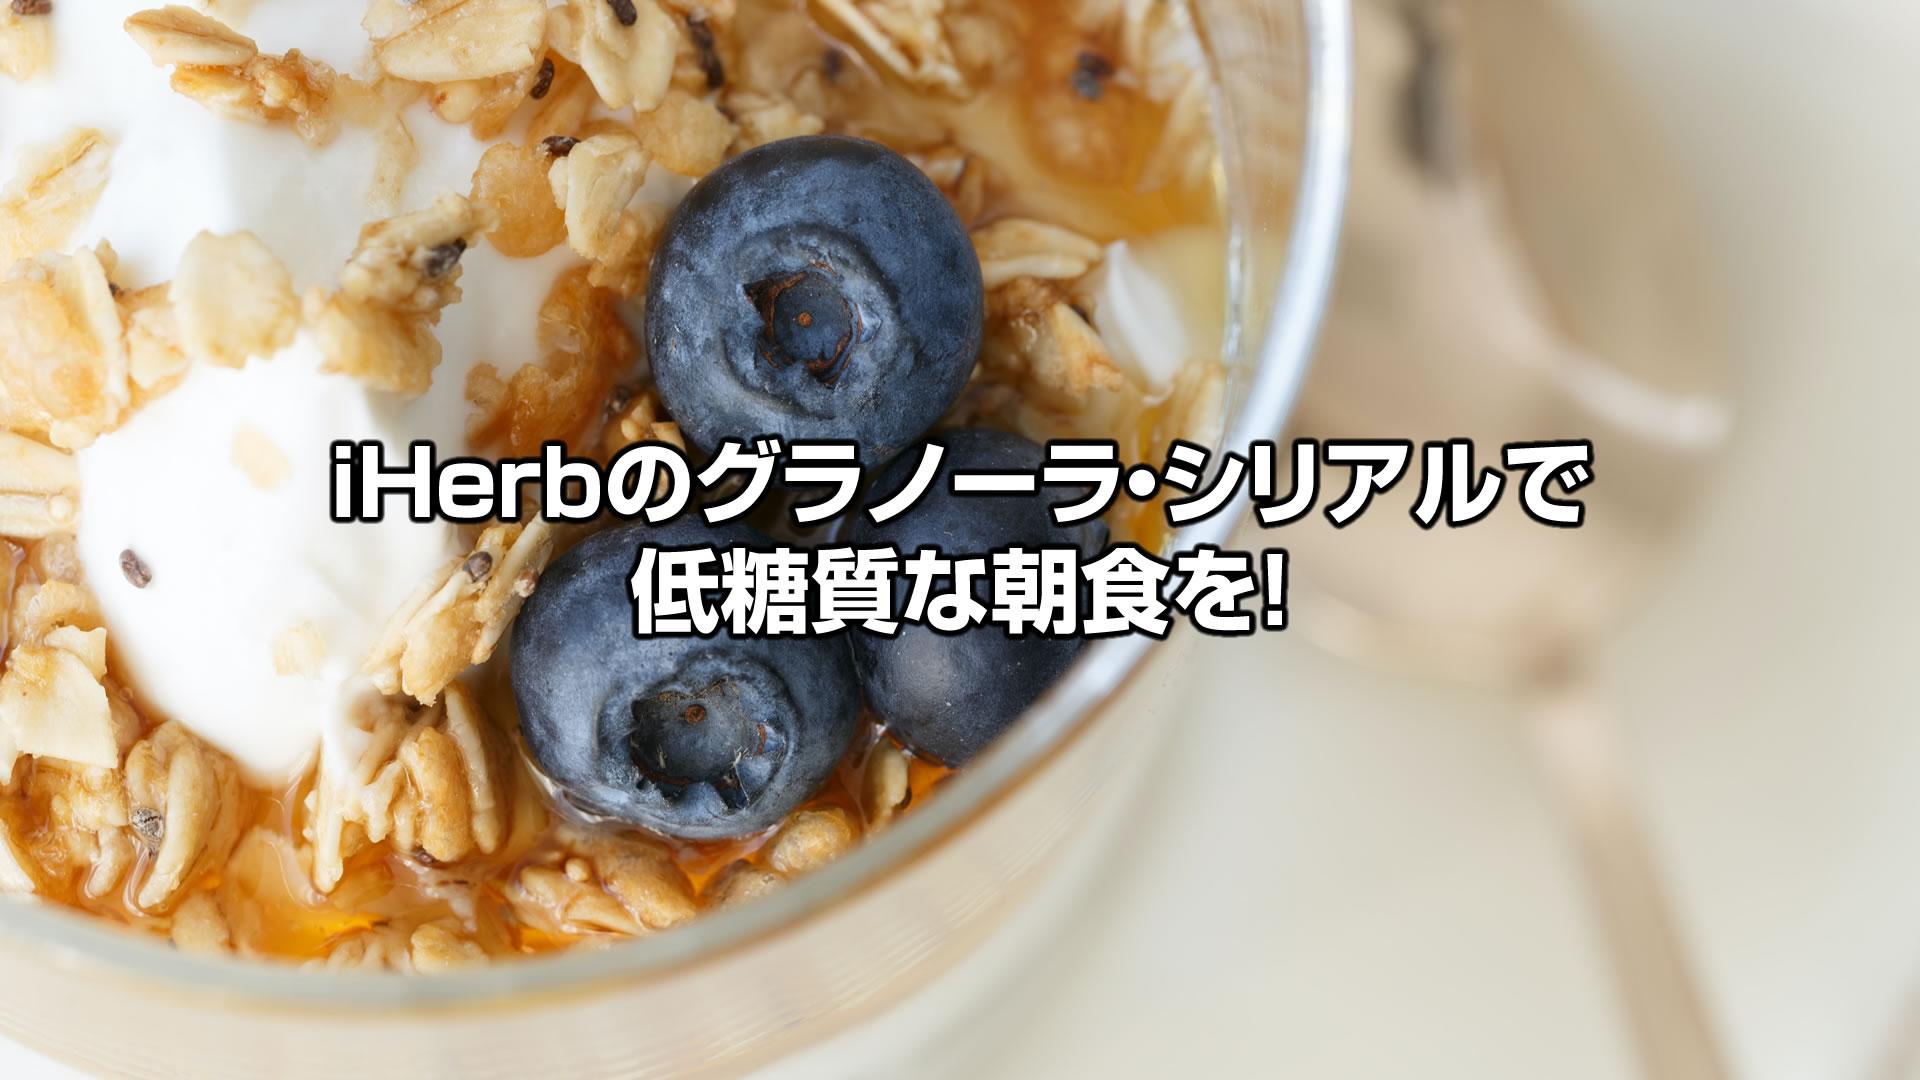 iHerb(アイハーブ)のグラノーラ・シリアルで低糖質朝食